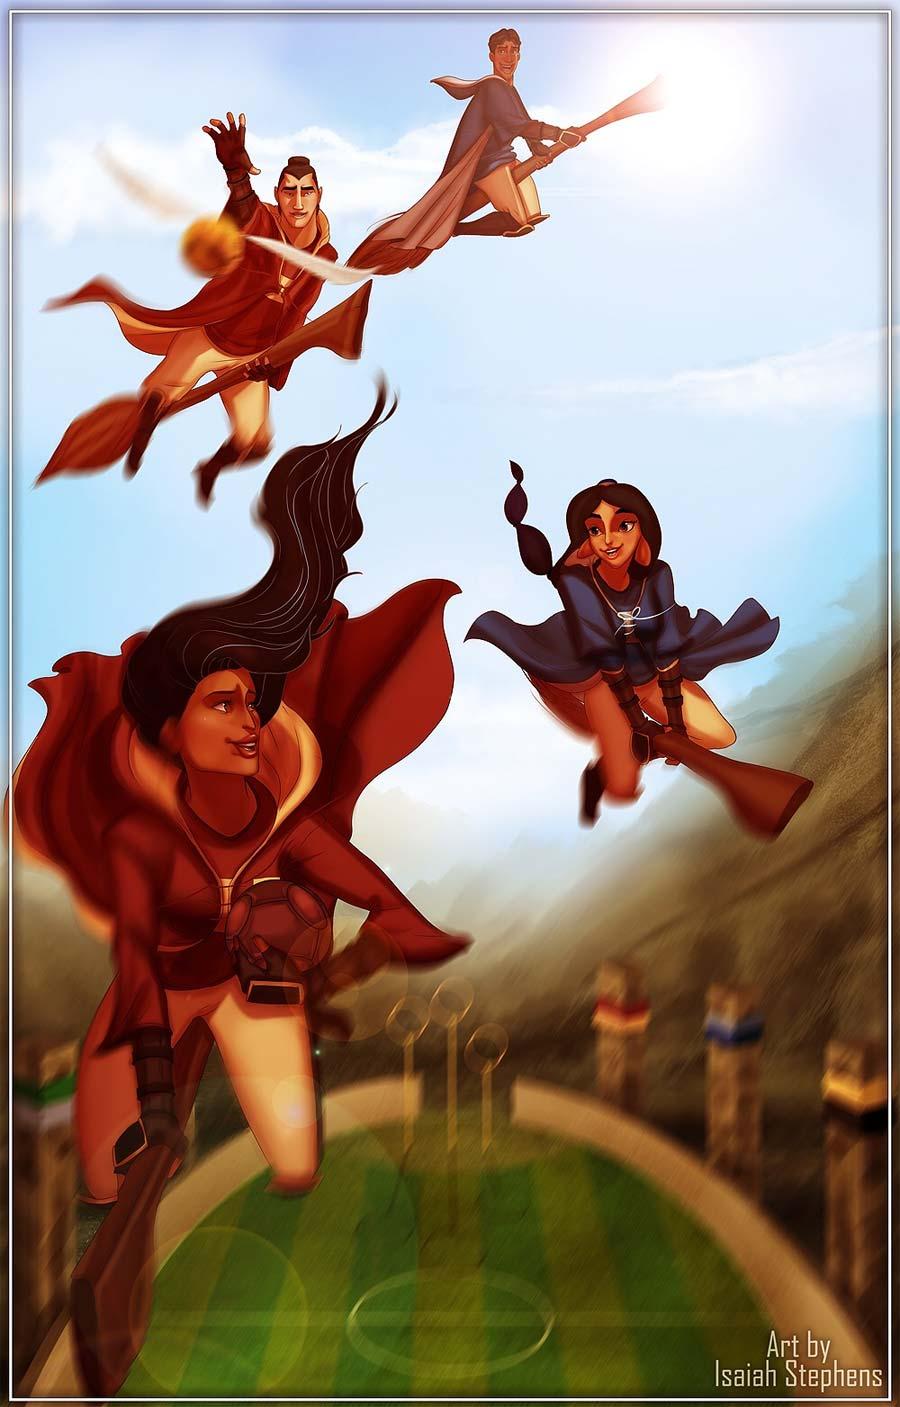 disney-ilustracoes-harrypotter-hogwarts-007